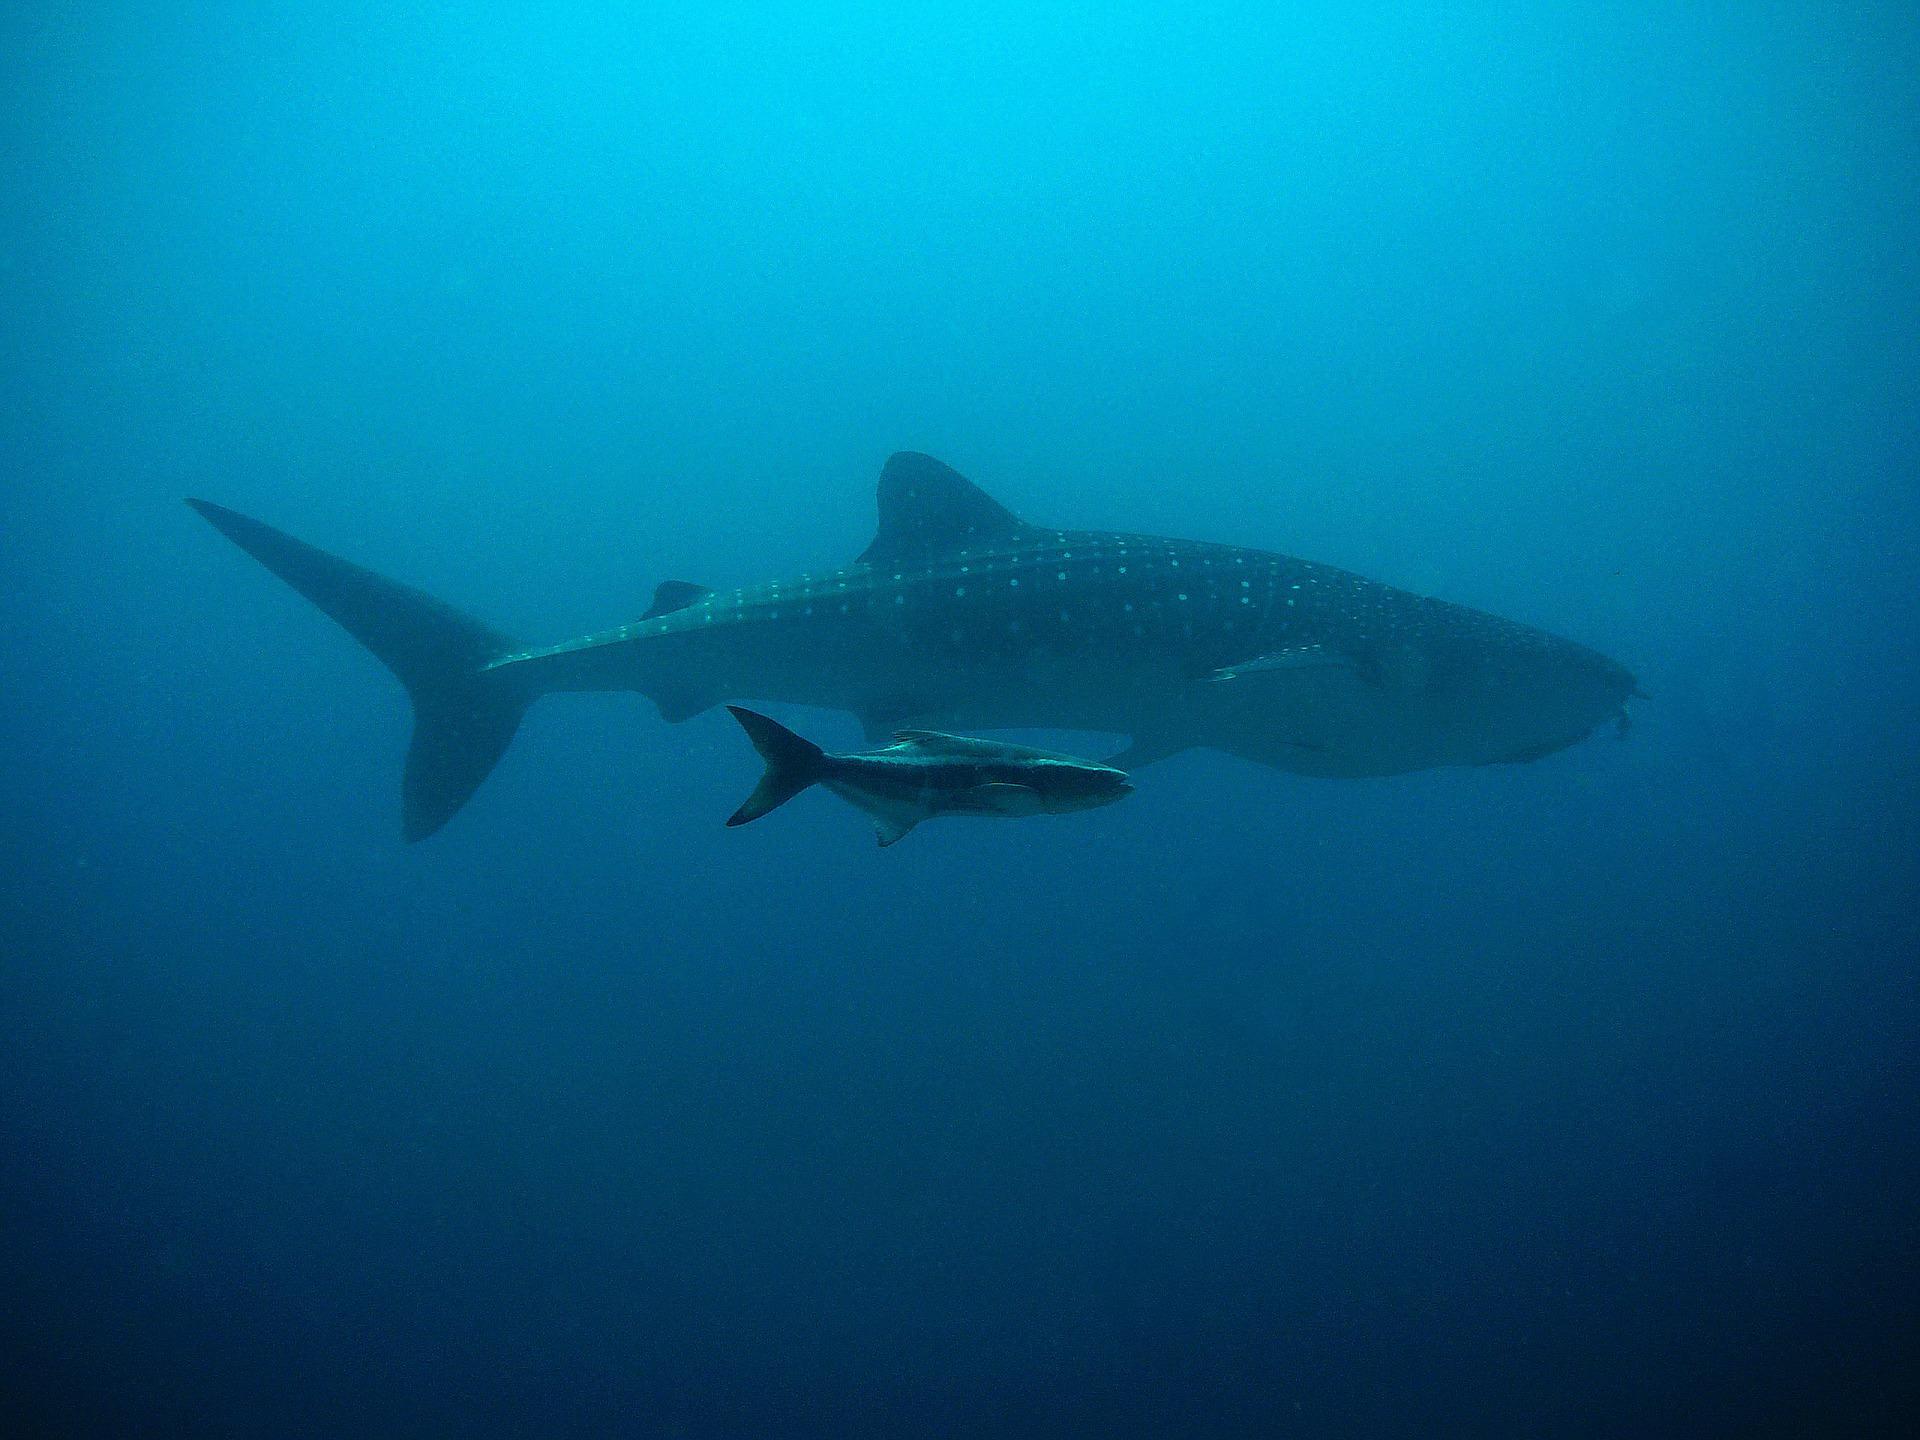 whale-shark-207401_1920.jpg